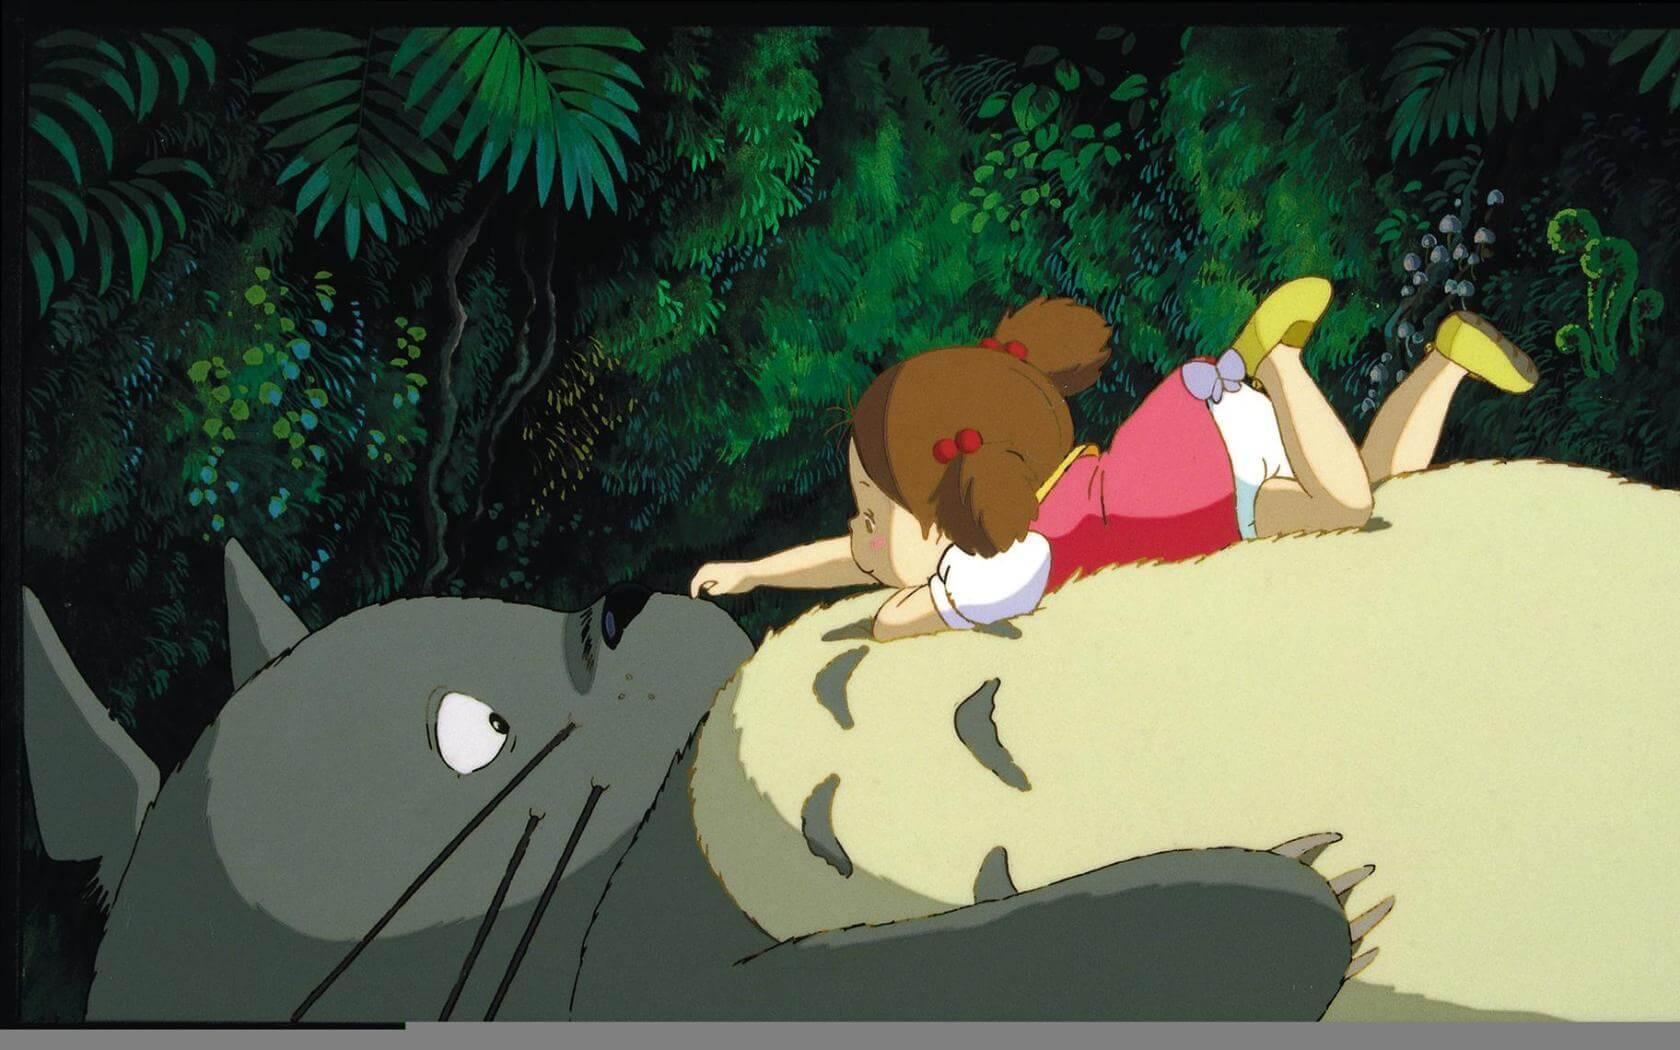 Descubre la magia de Studio Ghibli